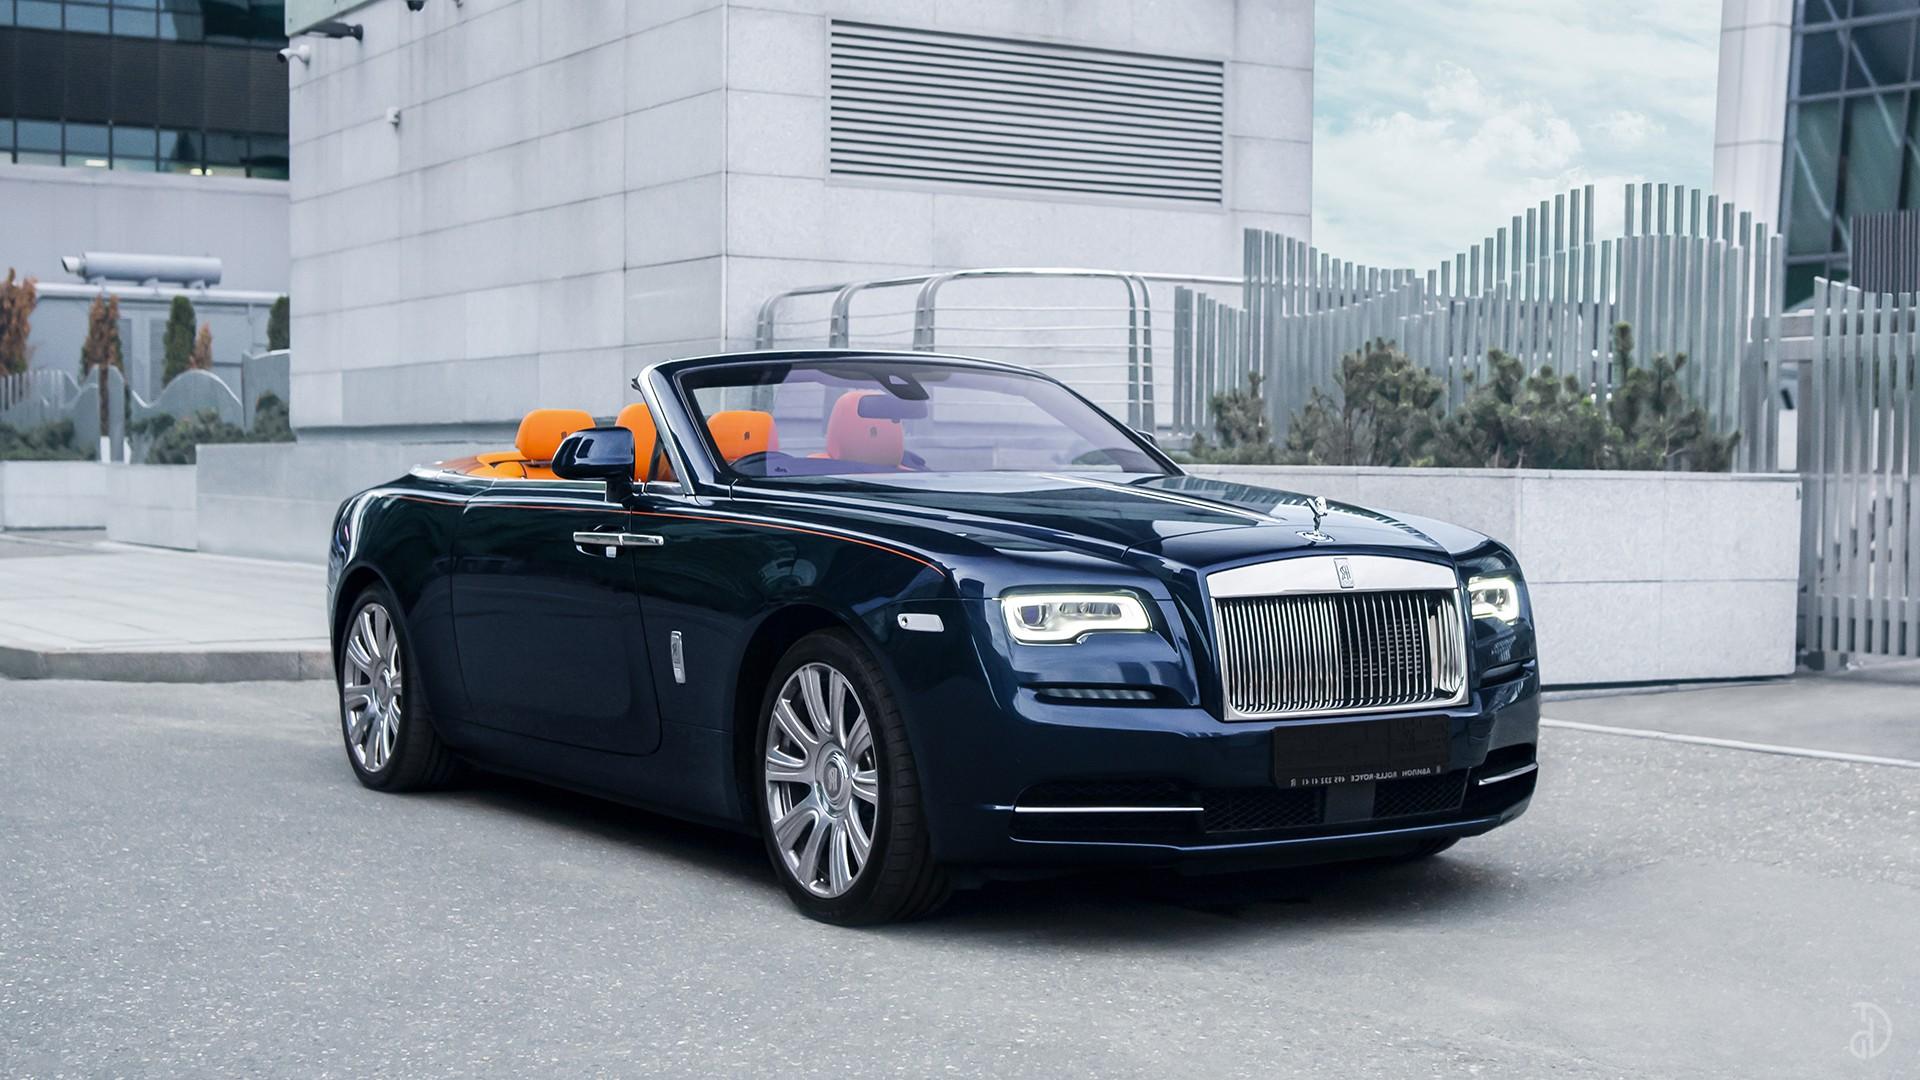 Аренда Rolls-Royce Dawn в Москве. Фото 1